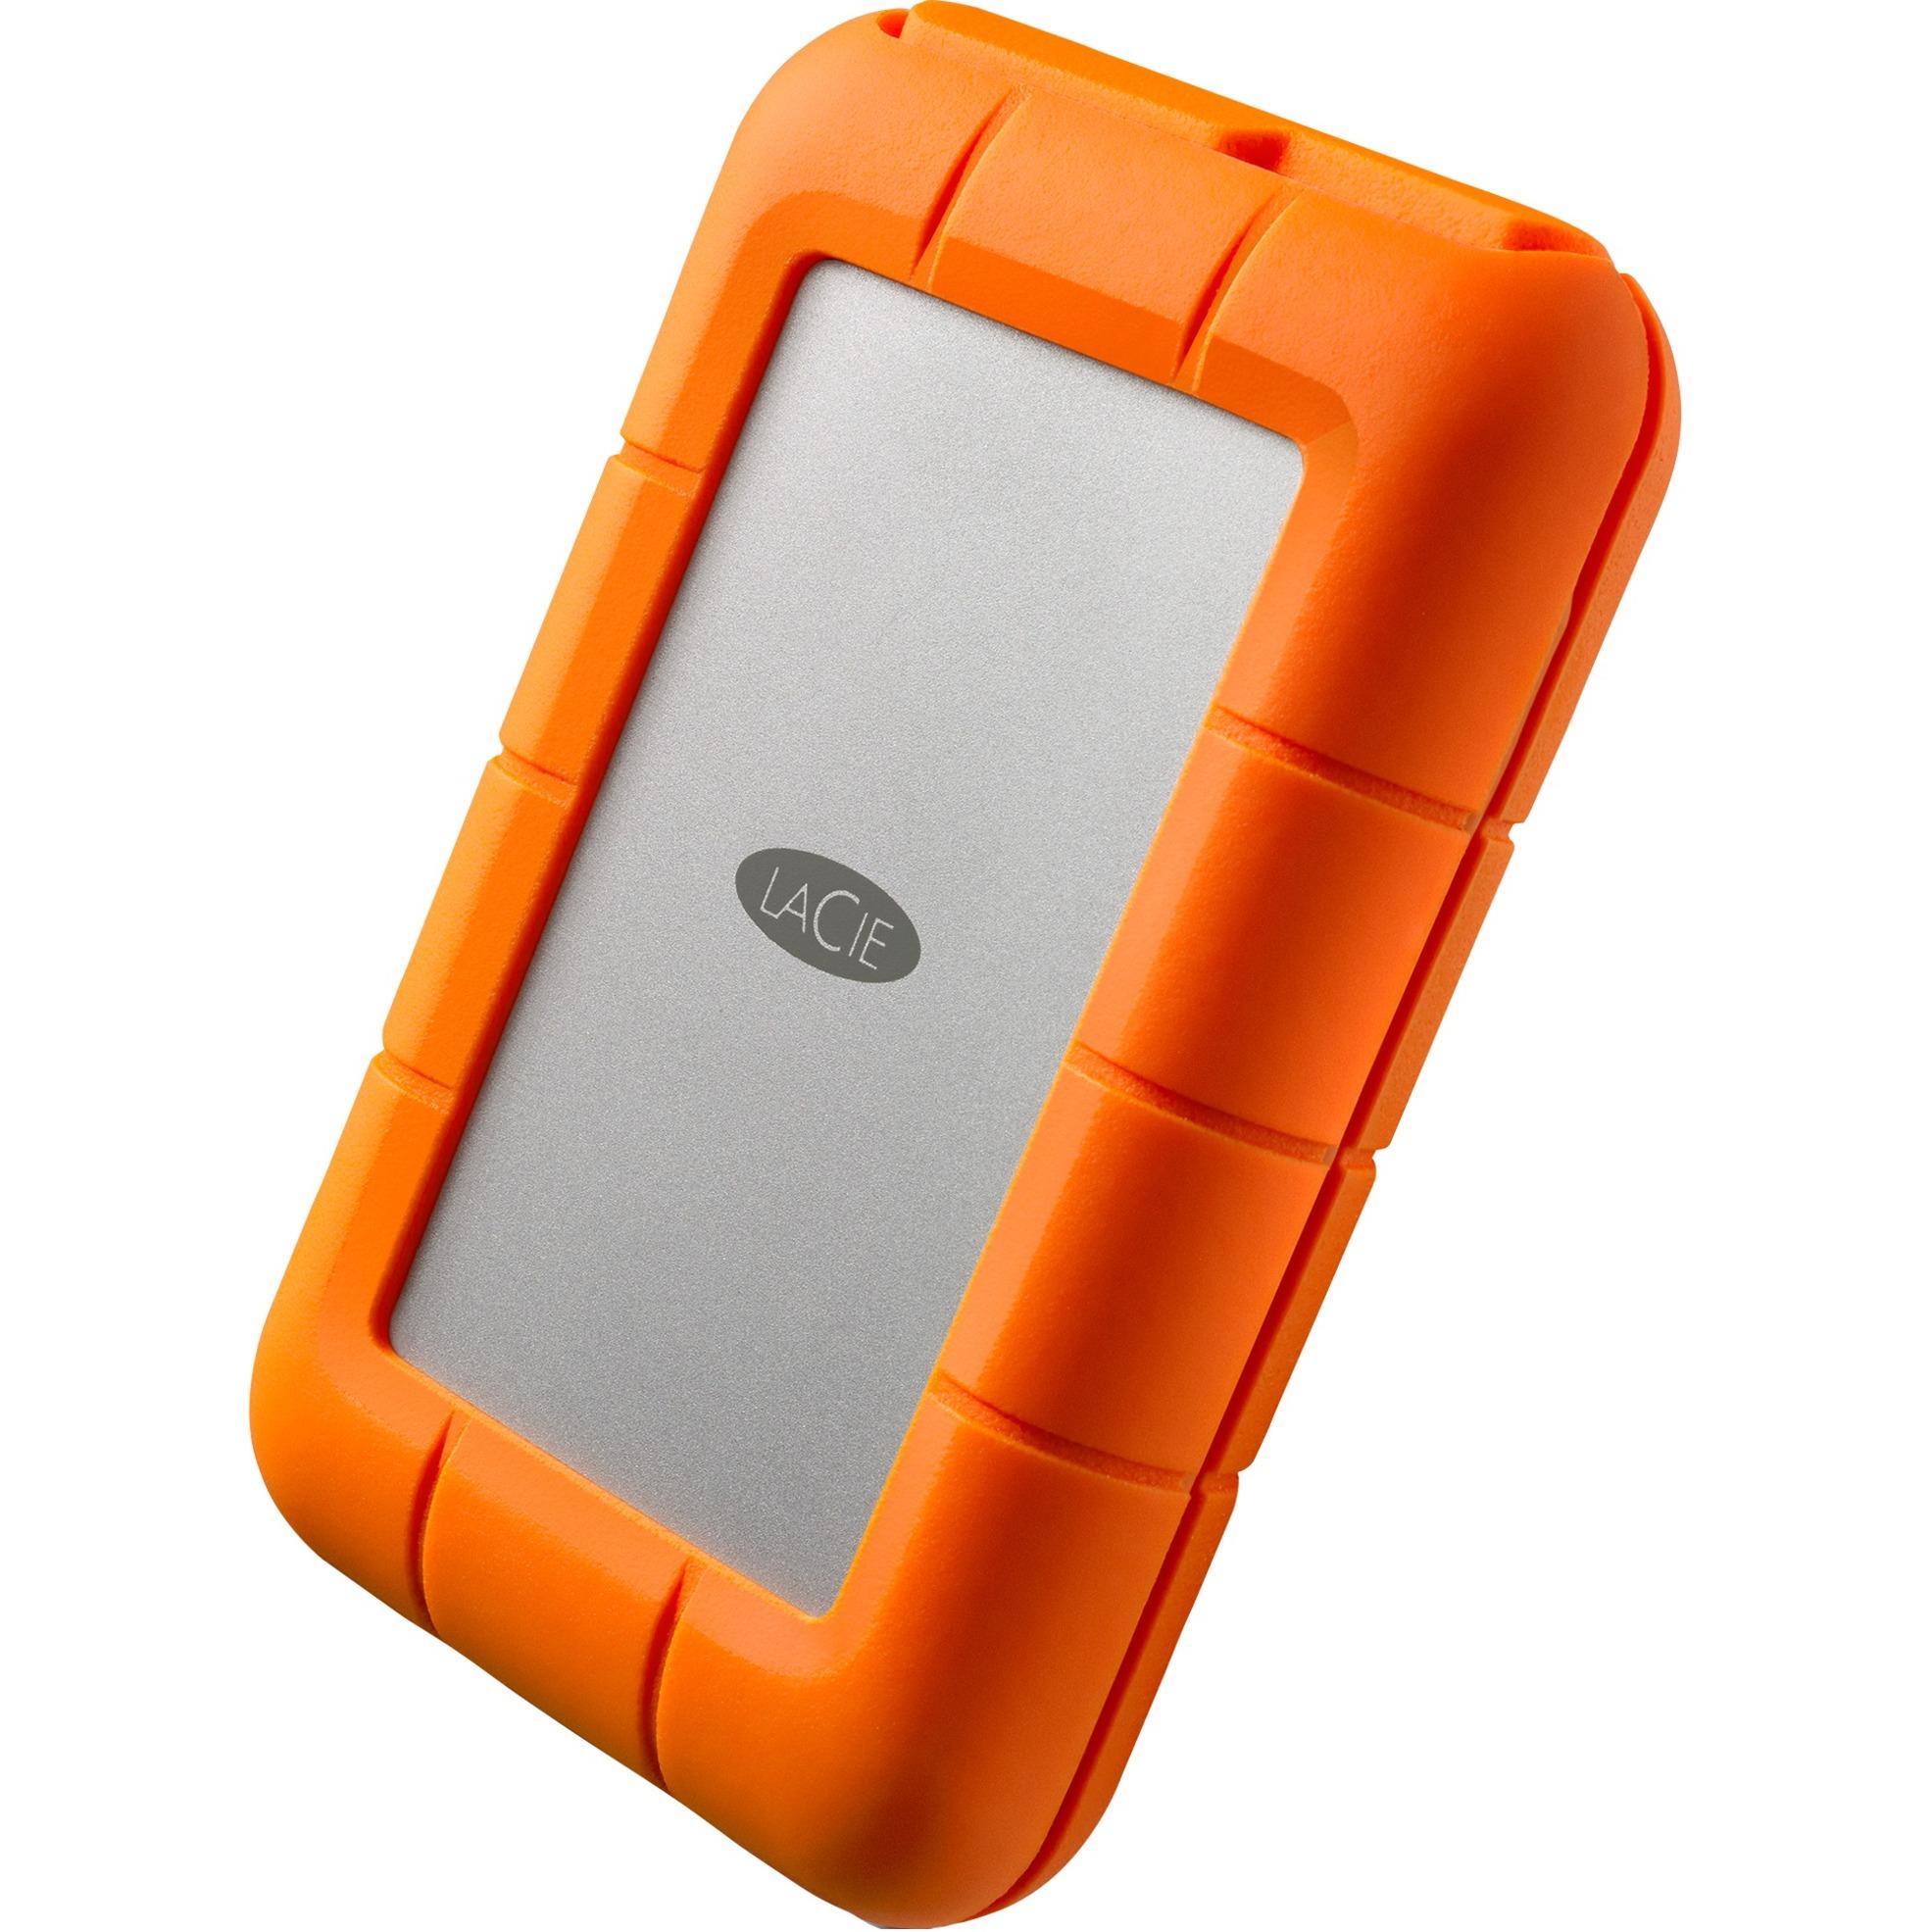 Rugged USB-C disco duro externo 1000 GB Naranja, Plata, Unidad de disco duro